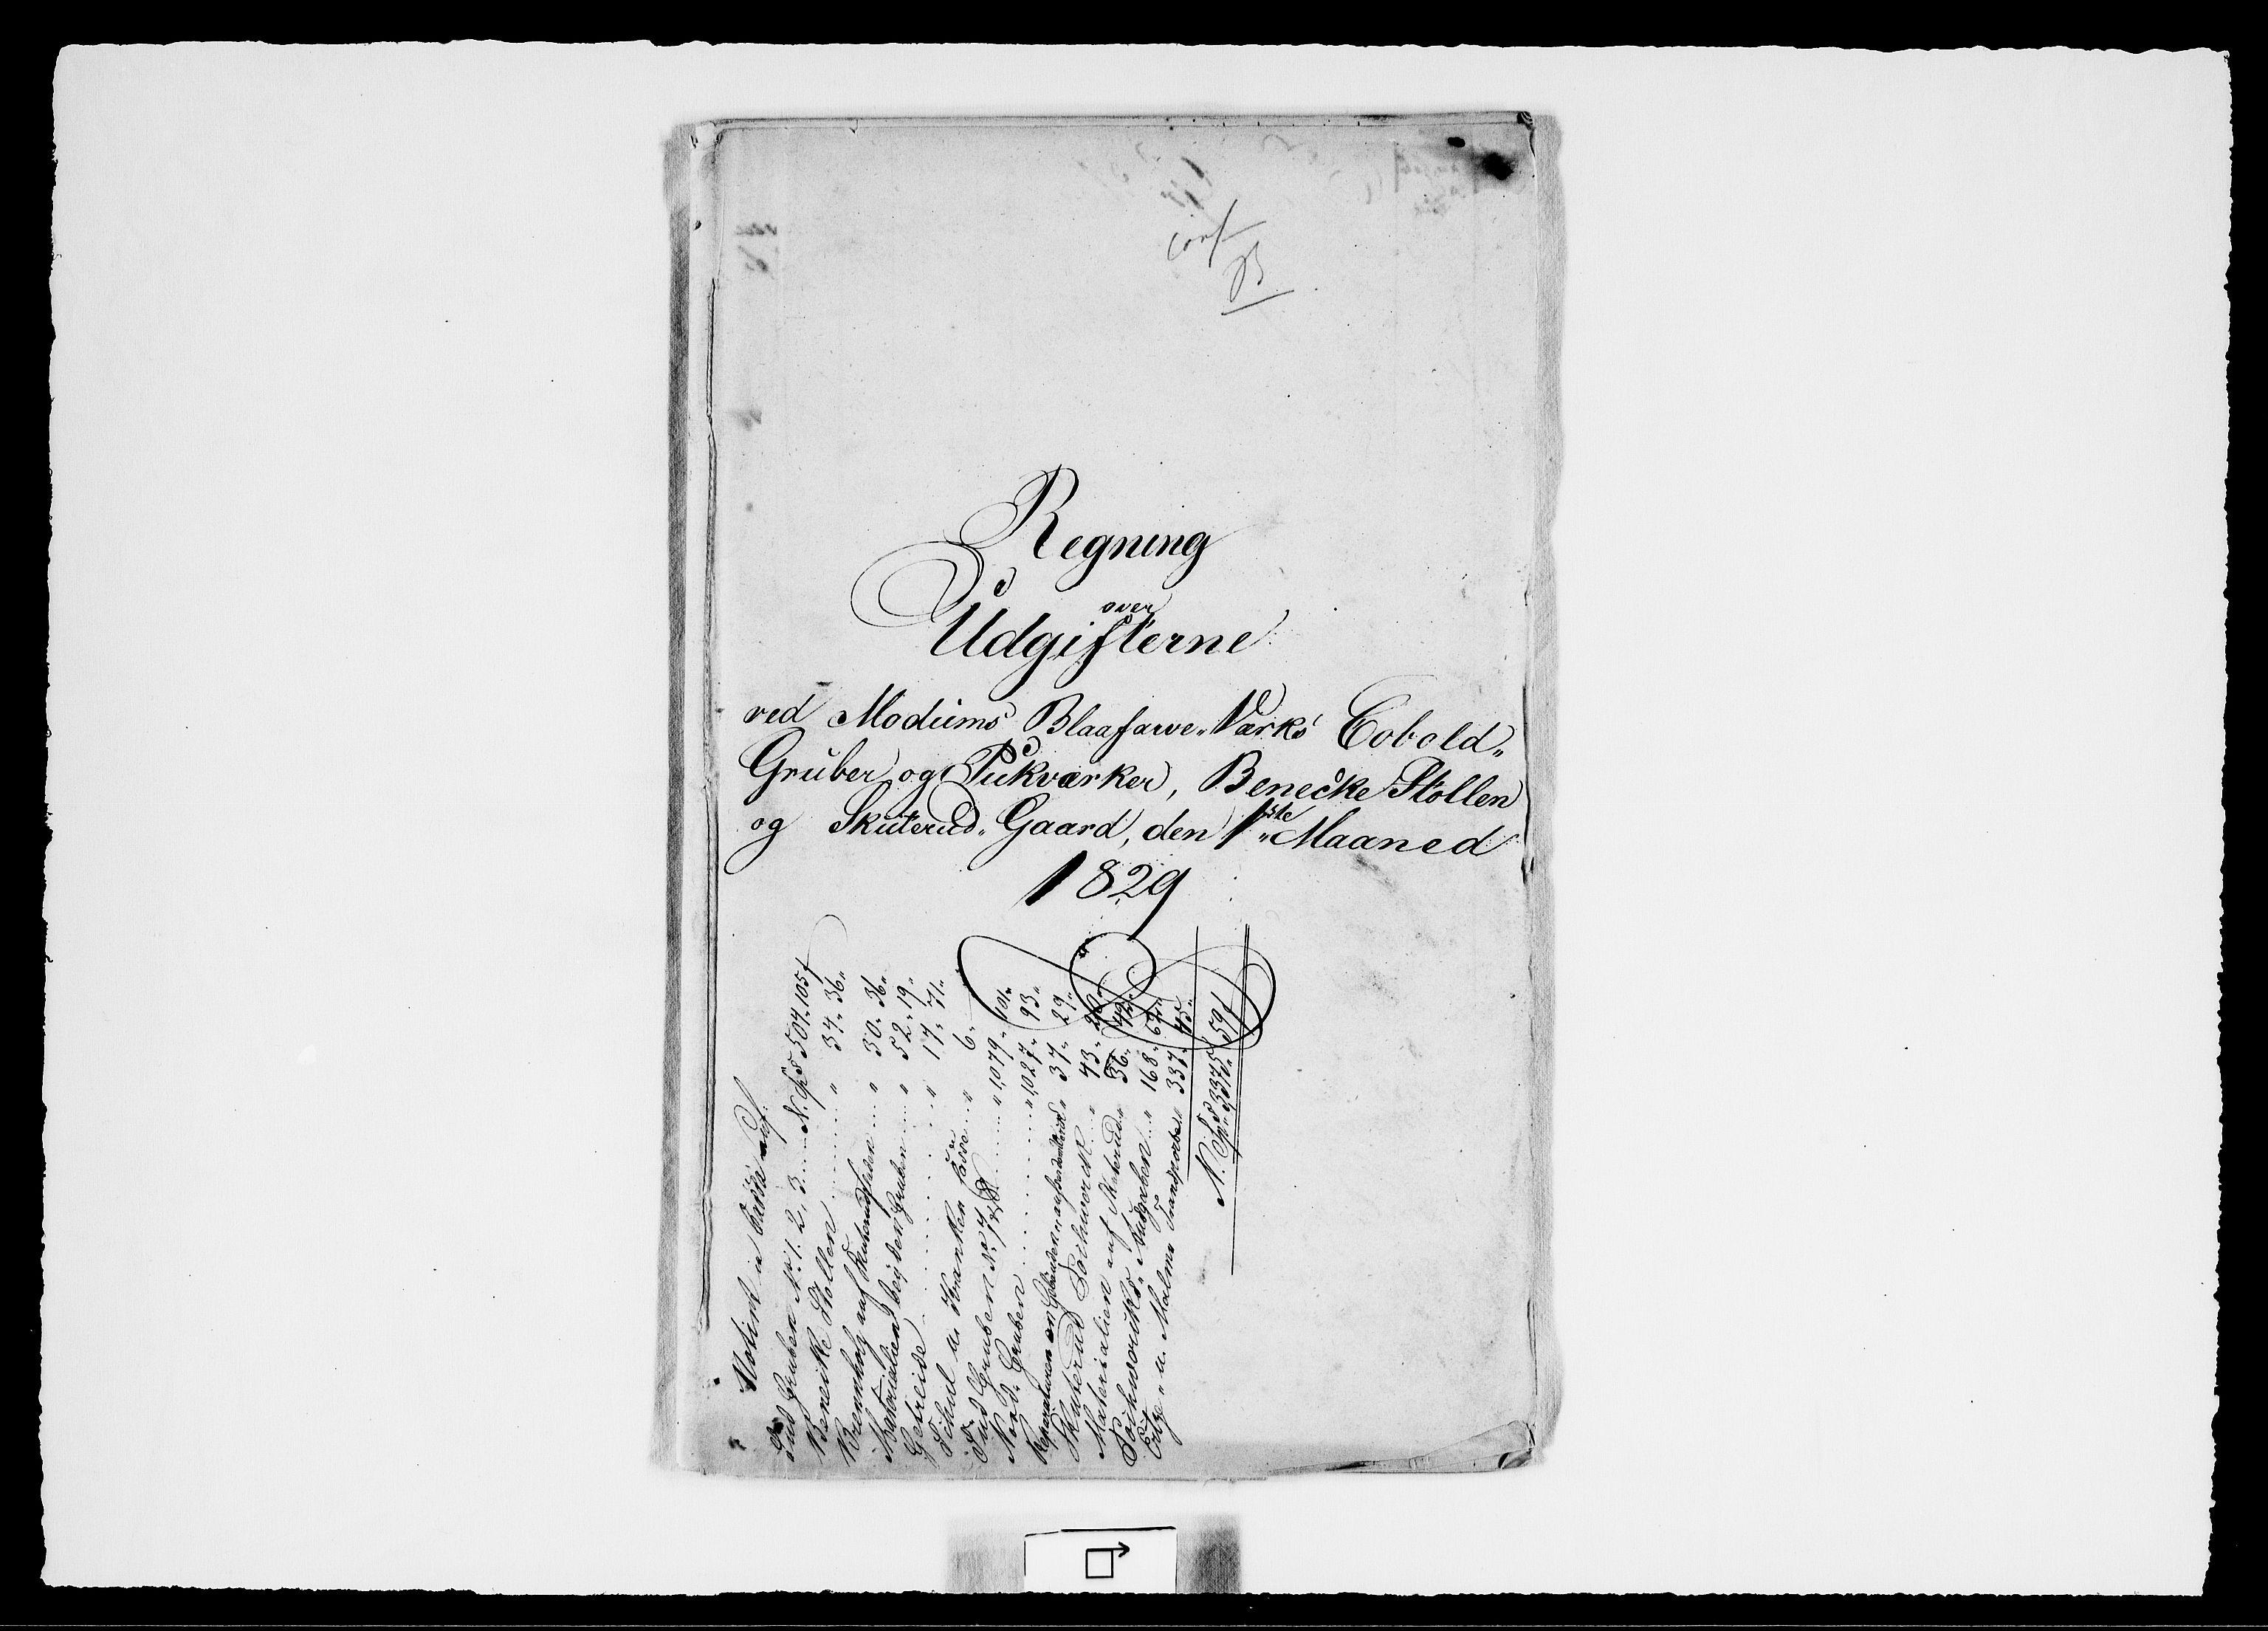 RA, Modums Blaafarveværk, G/Gd/Gdd/L0257, 1829-1830, s. 2